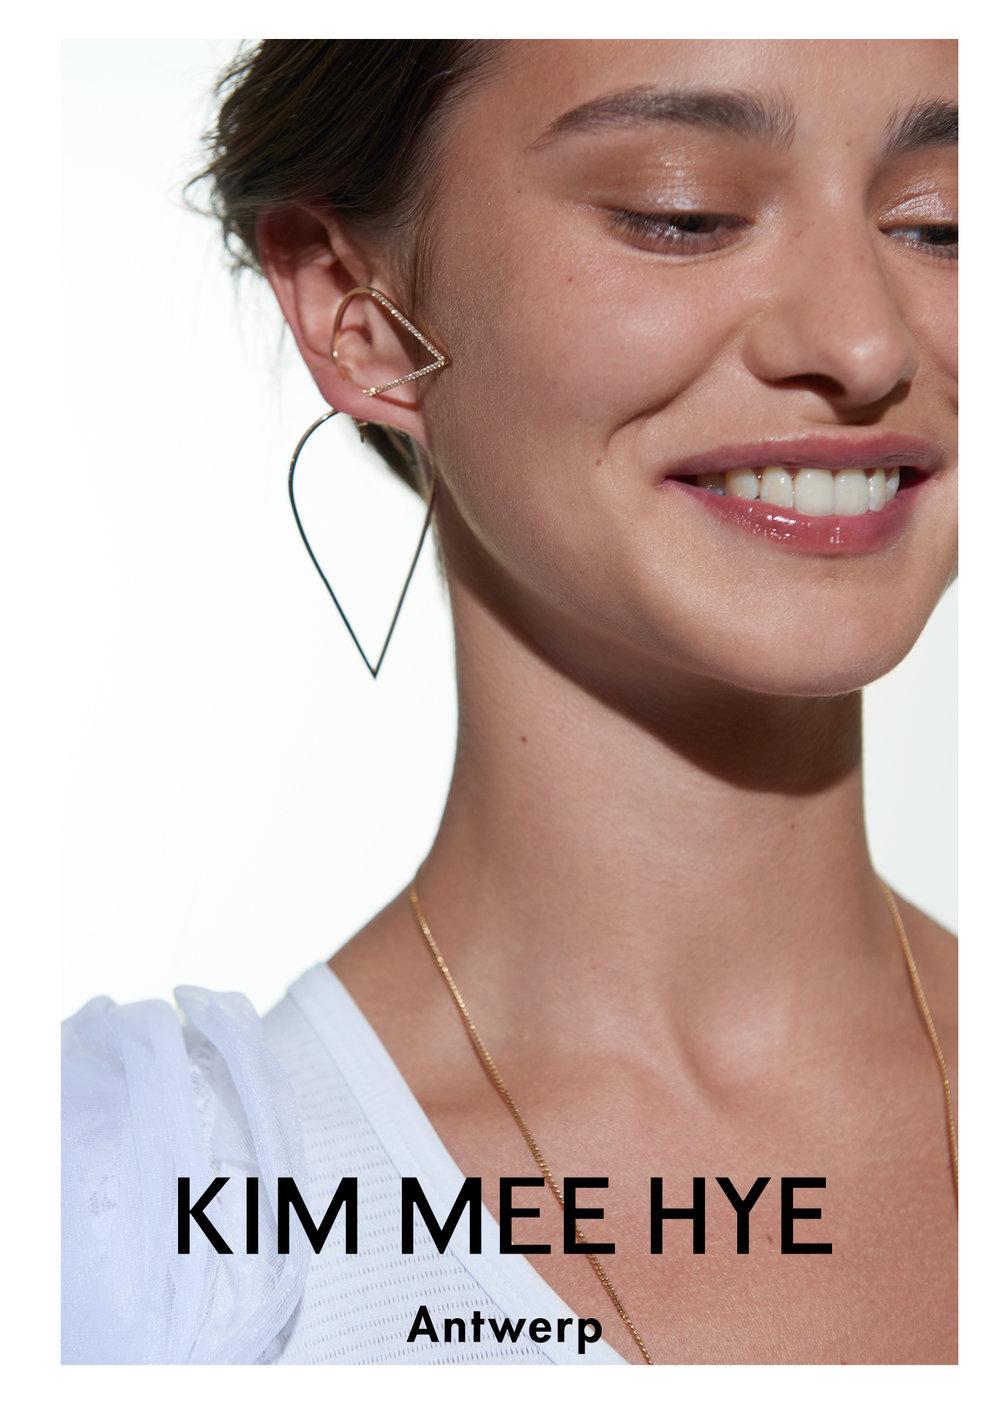 kimmeehye